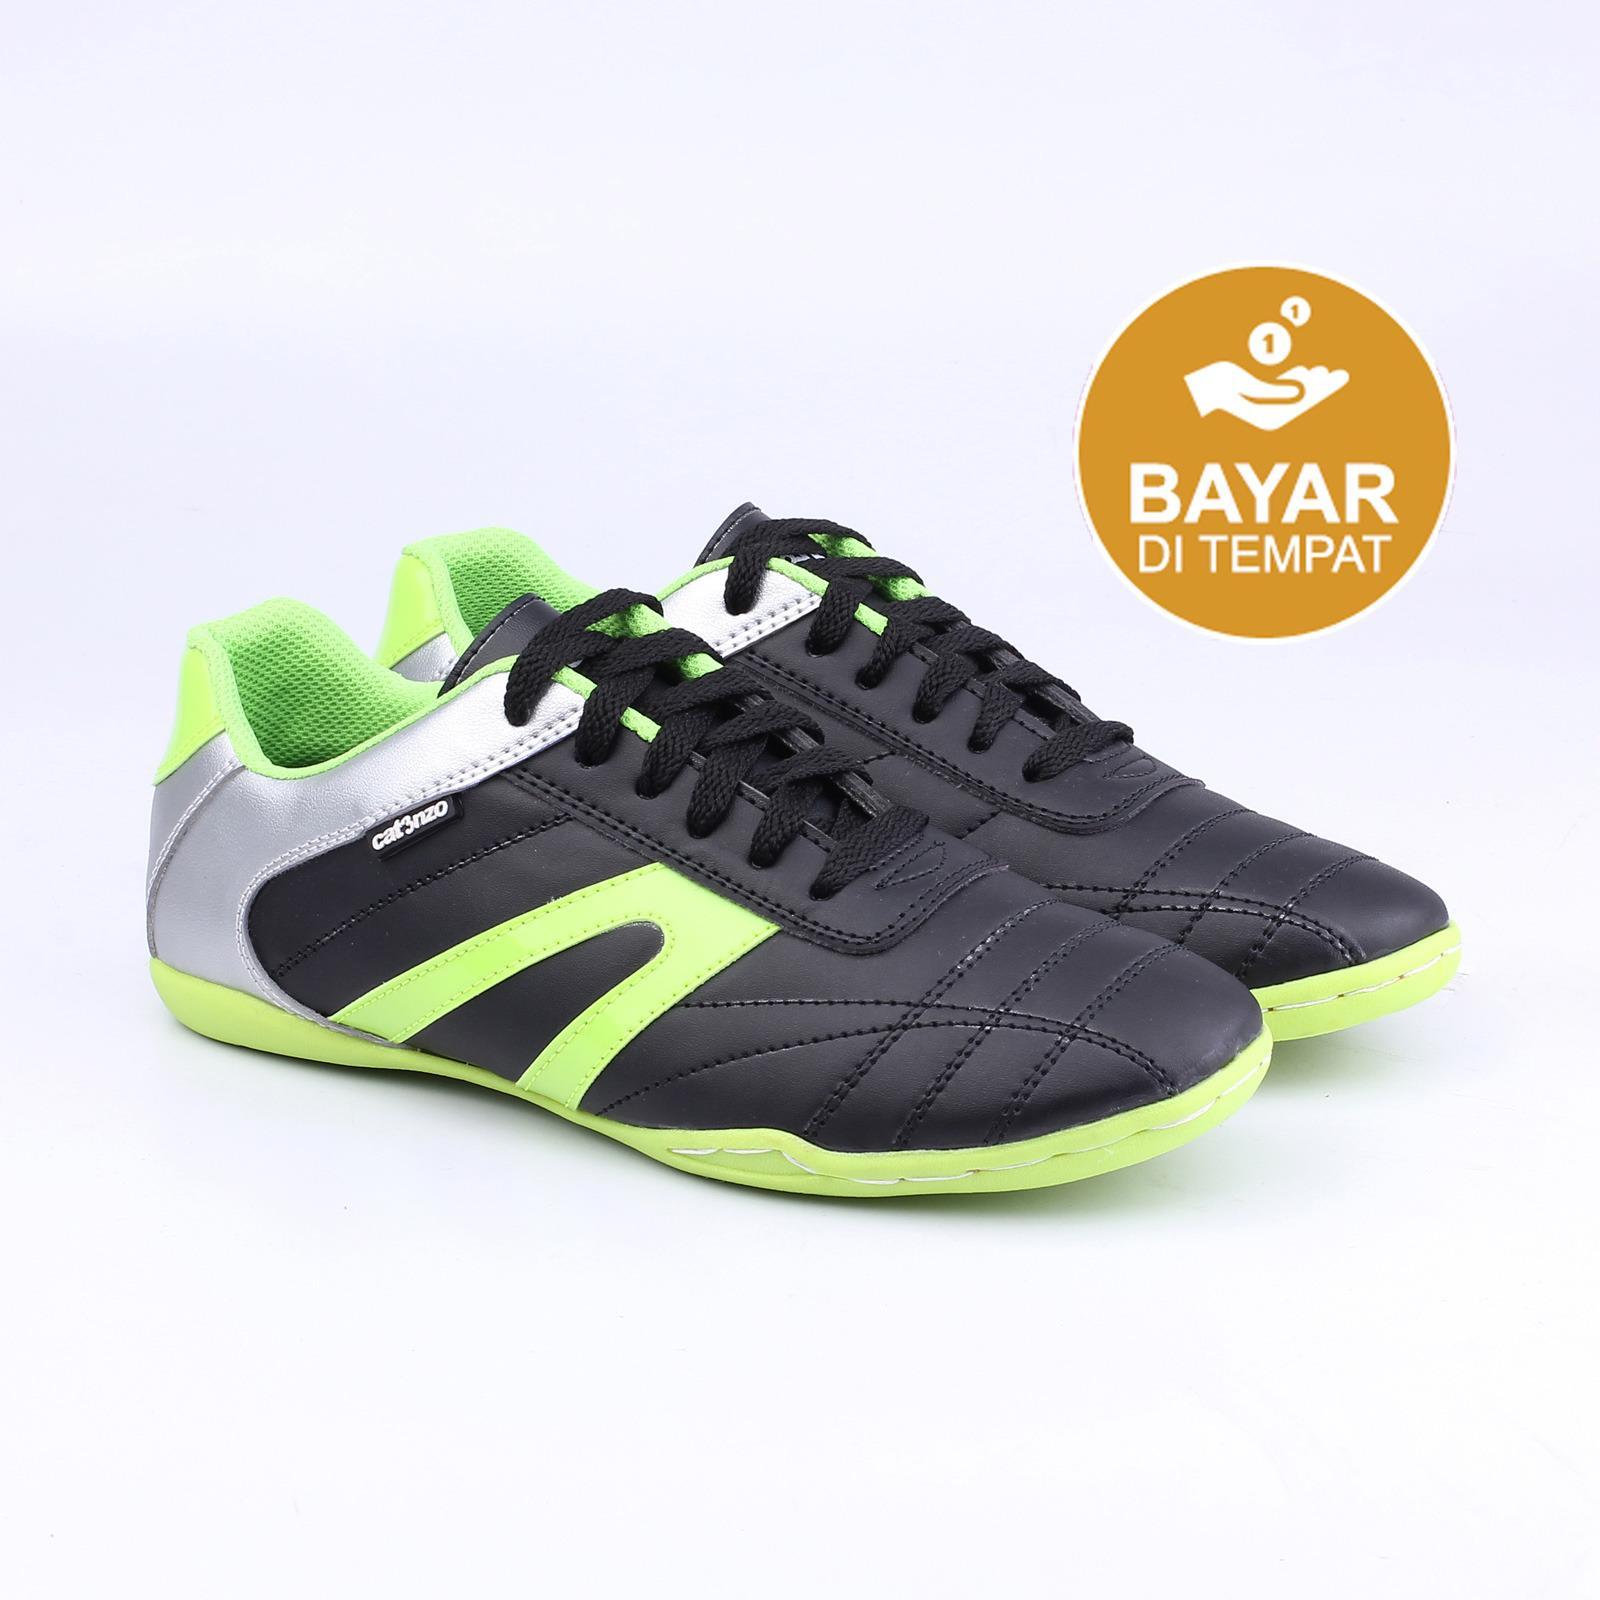 Futsal Shoes Catenzo Sandal Pria Outdoor Full Black Sepatu Original Ns Best Seller